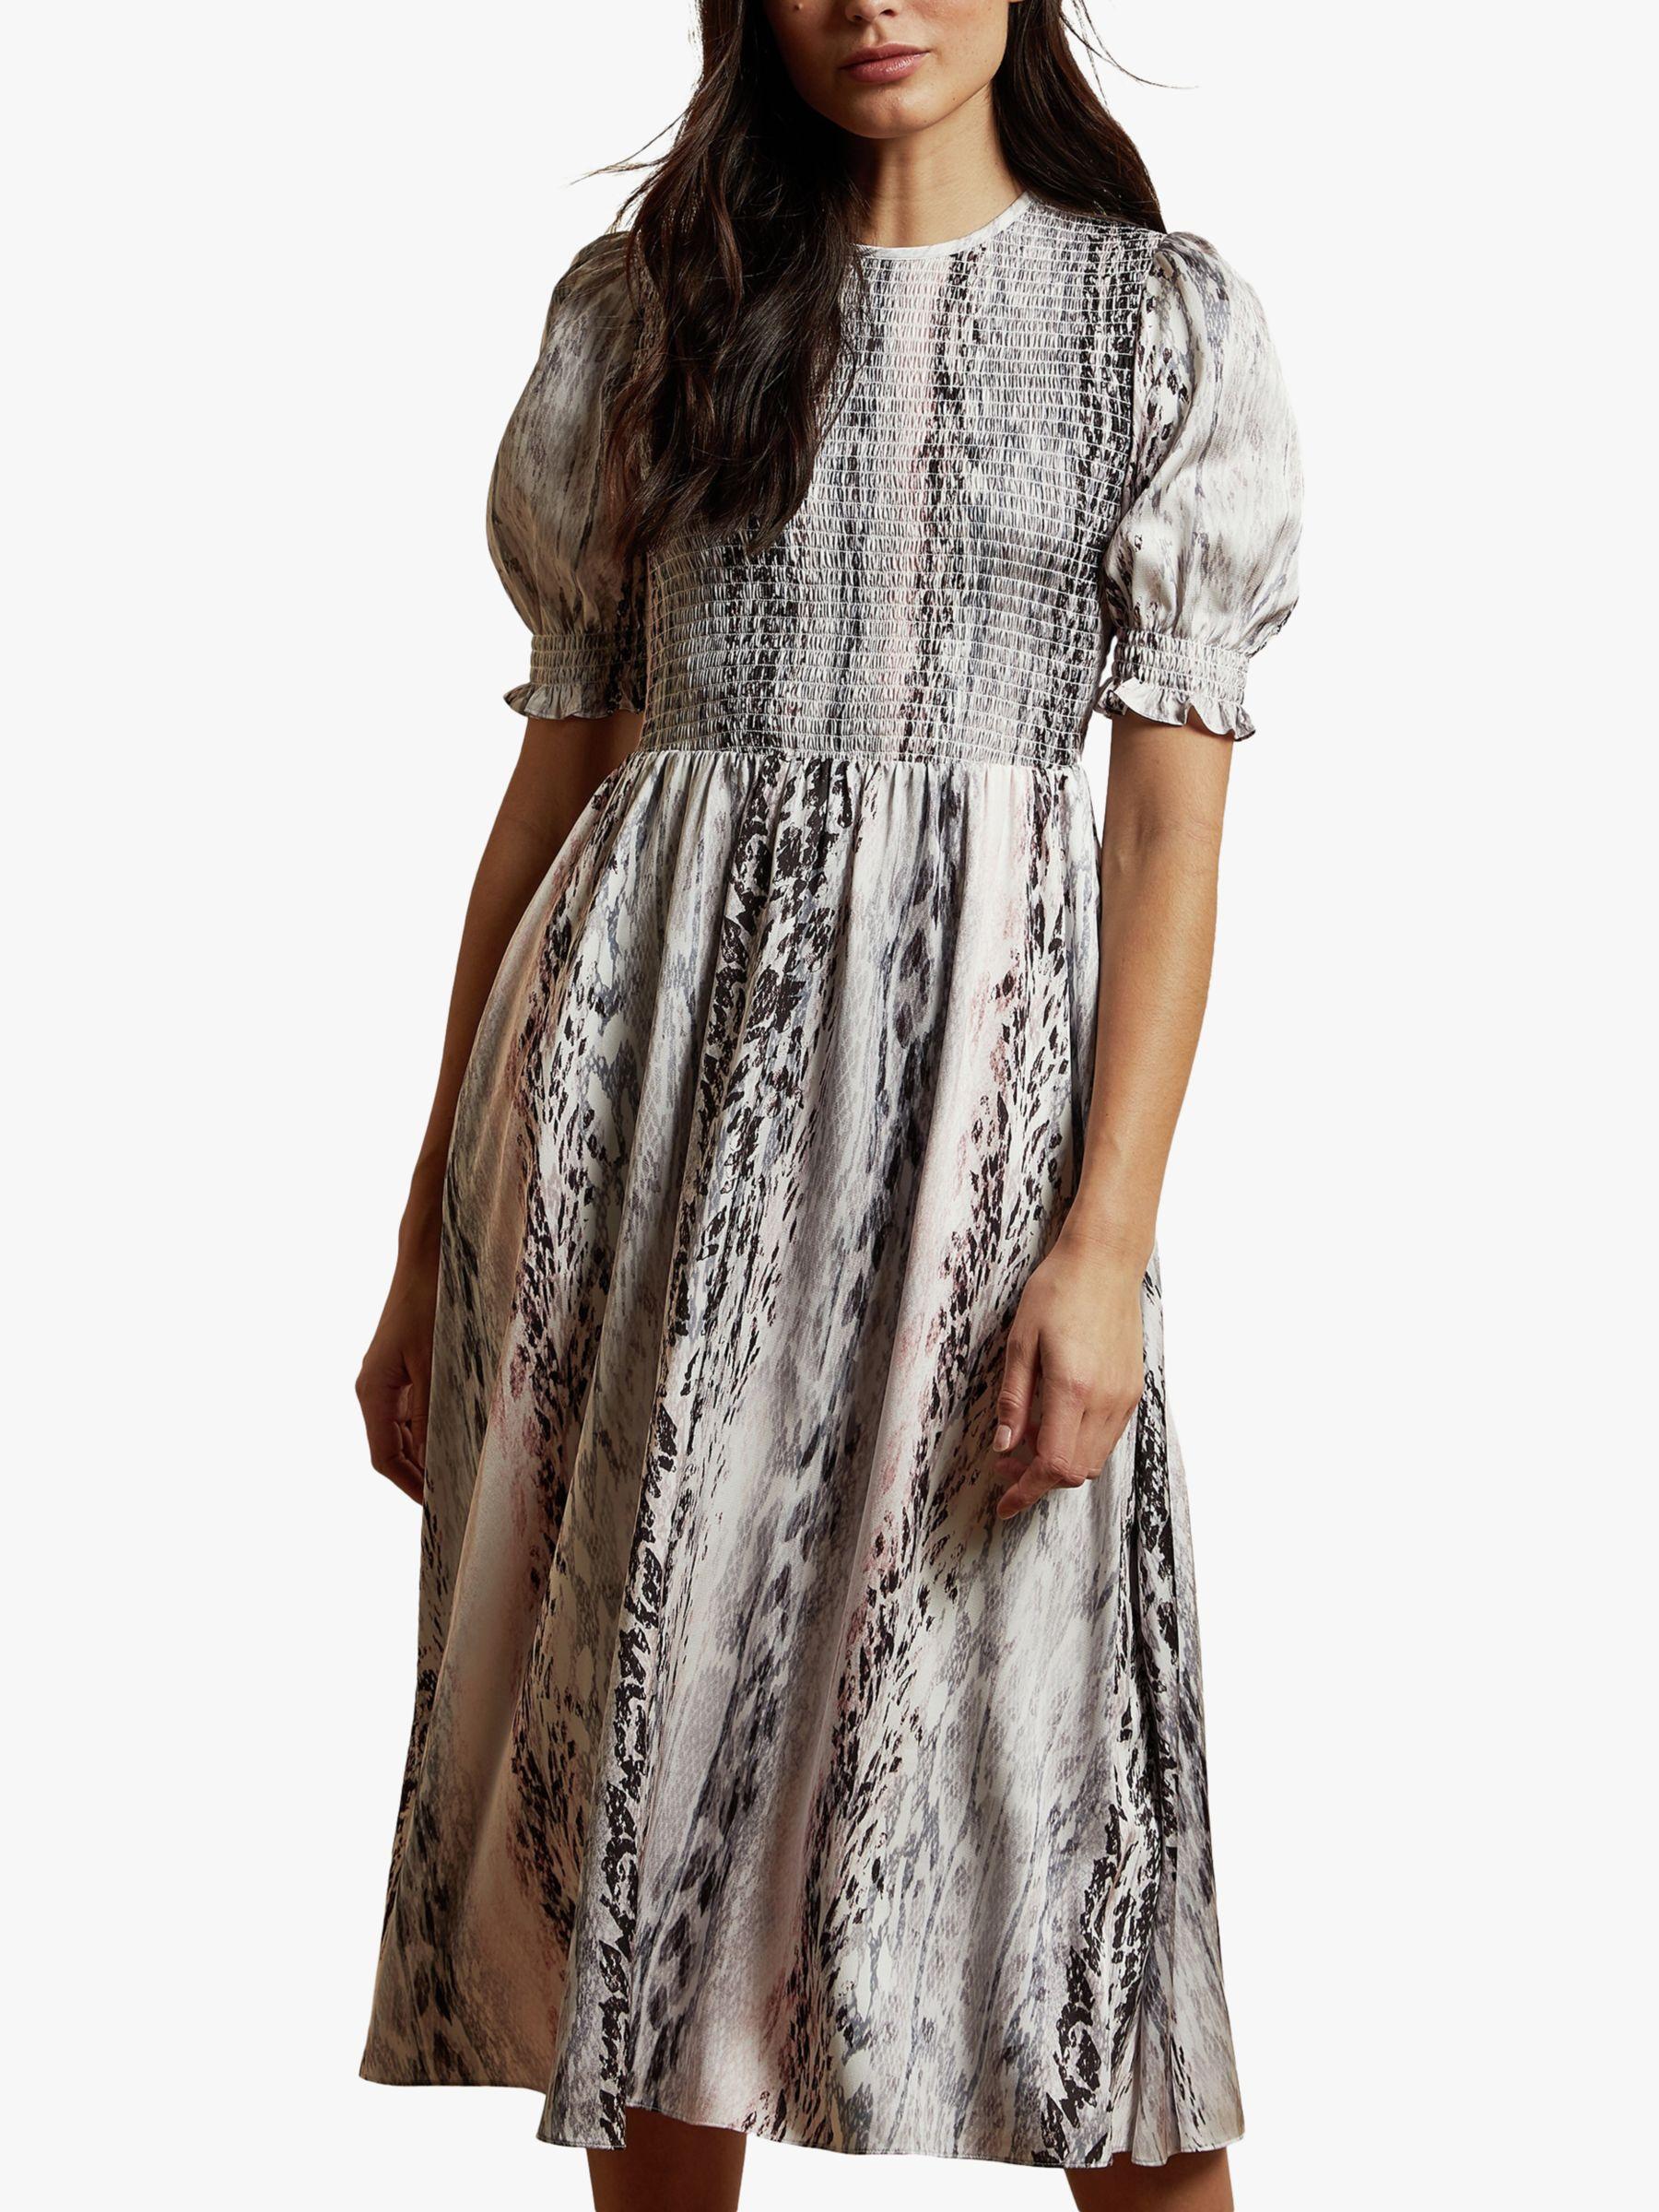 AUTH Ted Baker HALOMAH Snake Print Short Sleeve Midi Dress Ivory Size 3,4